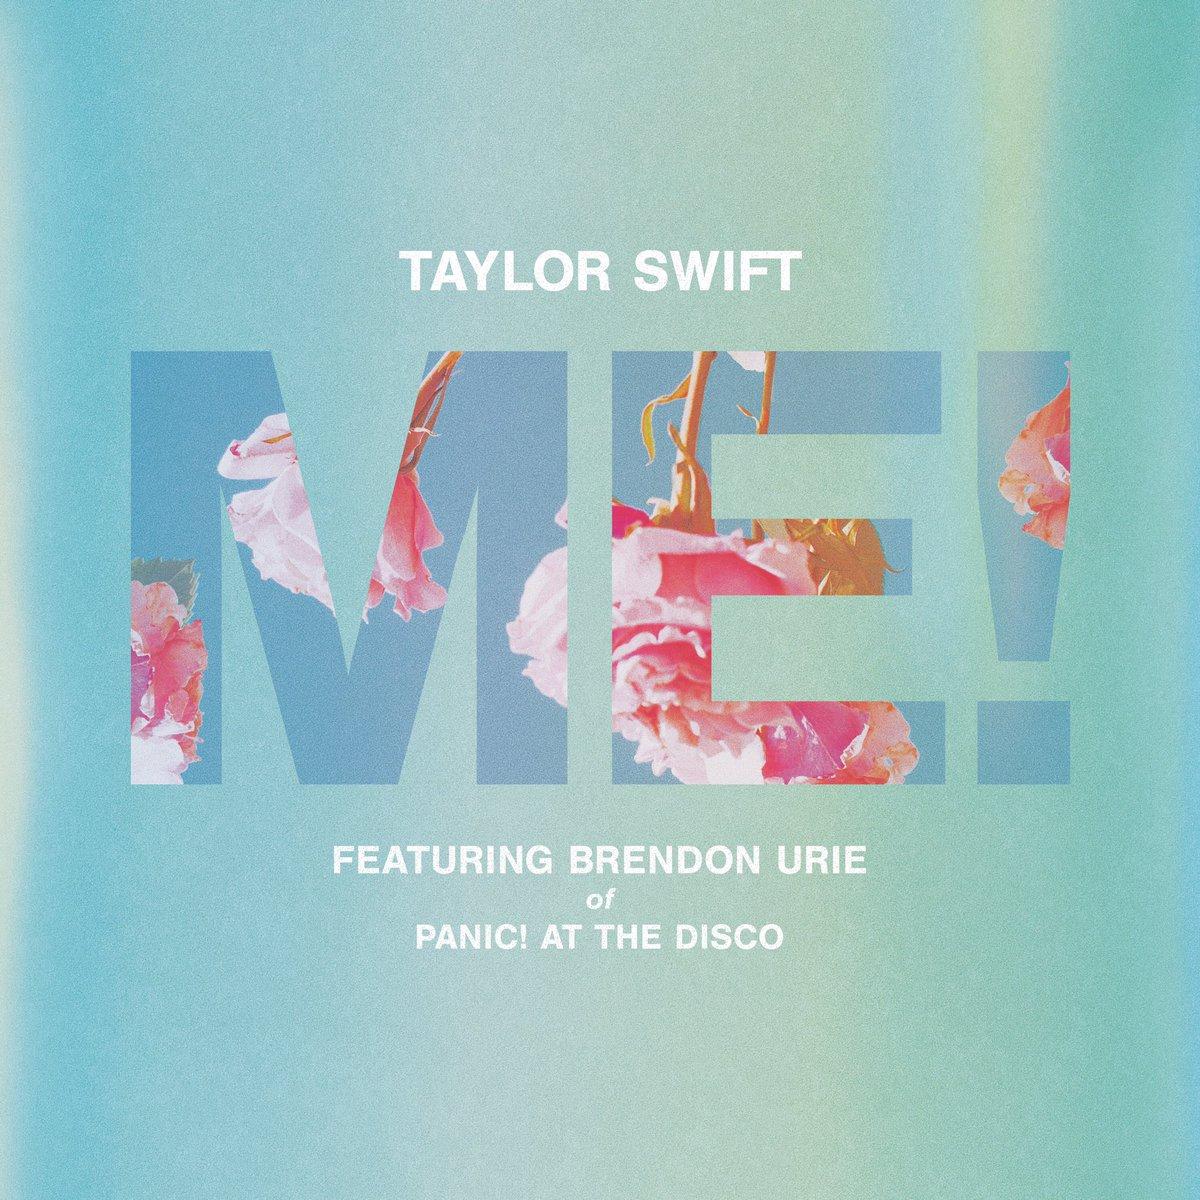 0f84030c0c Taylor Swift on Twitter: